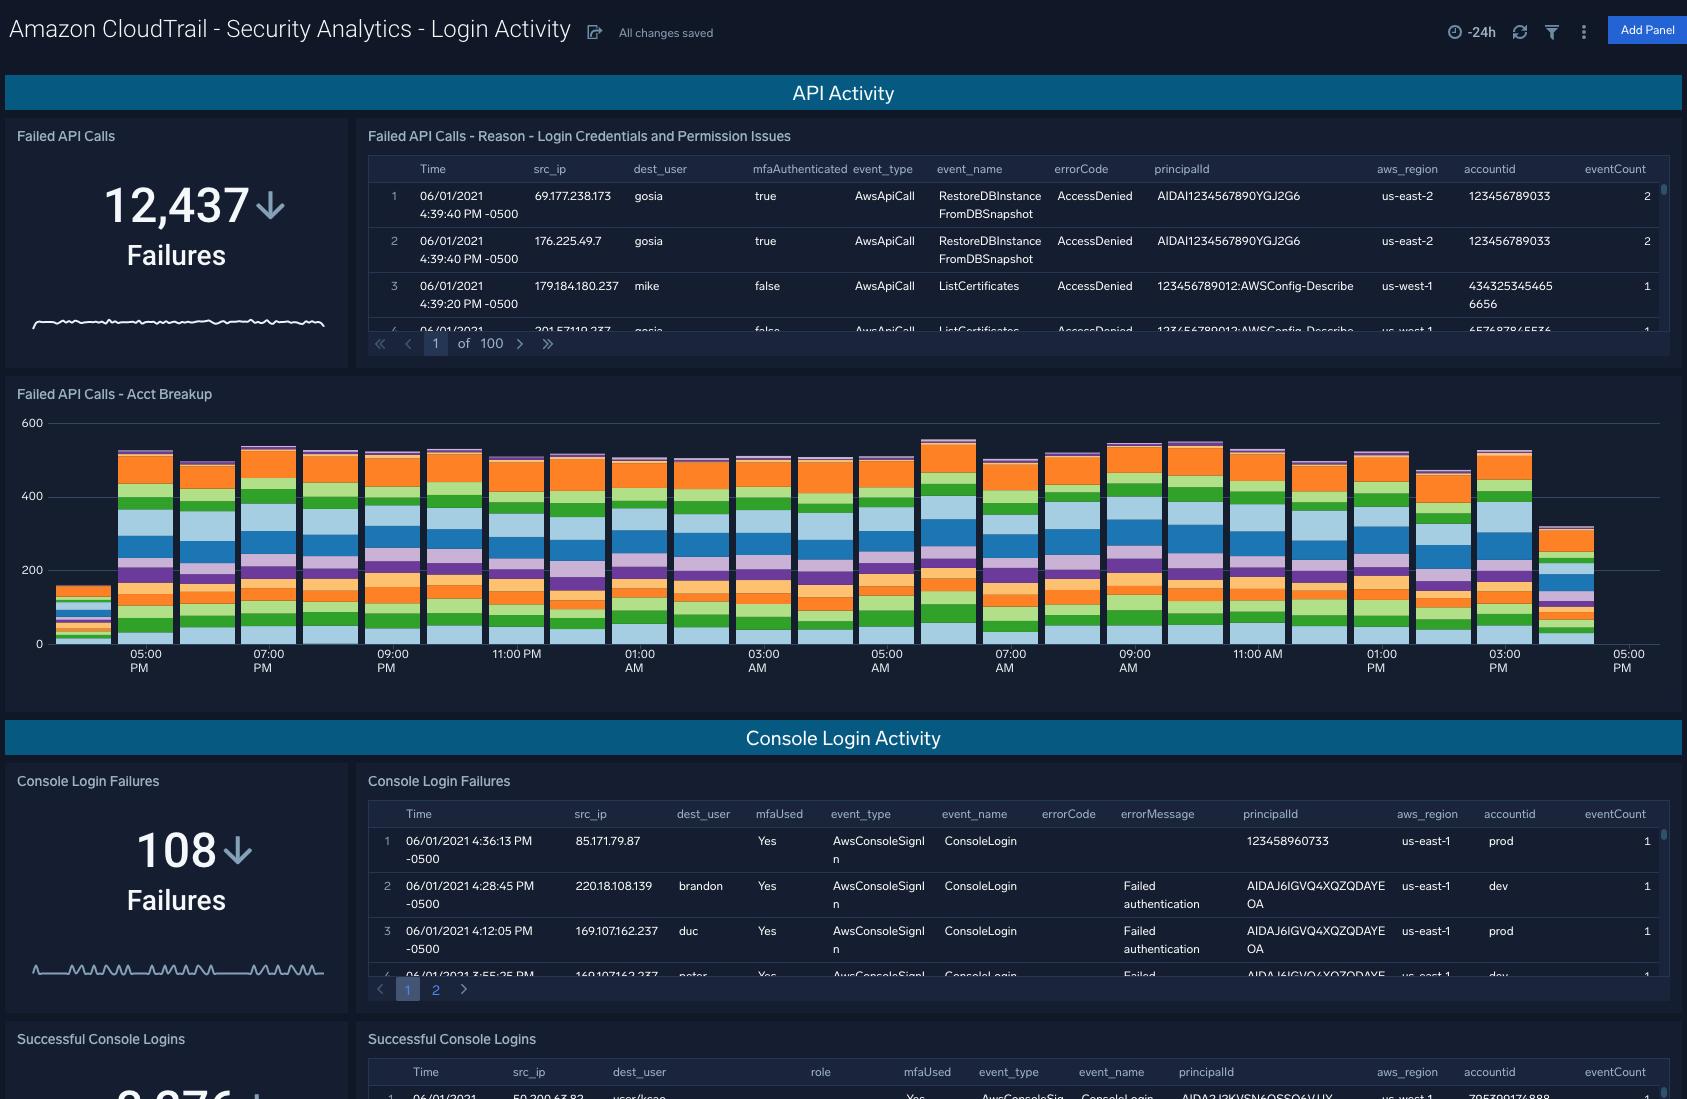 Amazon CloudTrail - Security Analytics - Login Activity